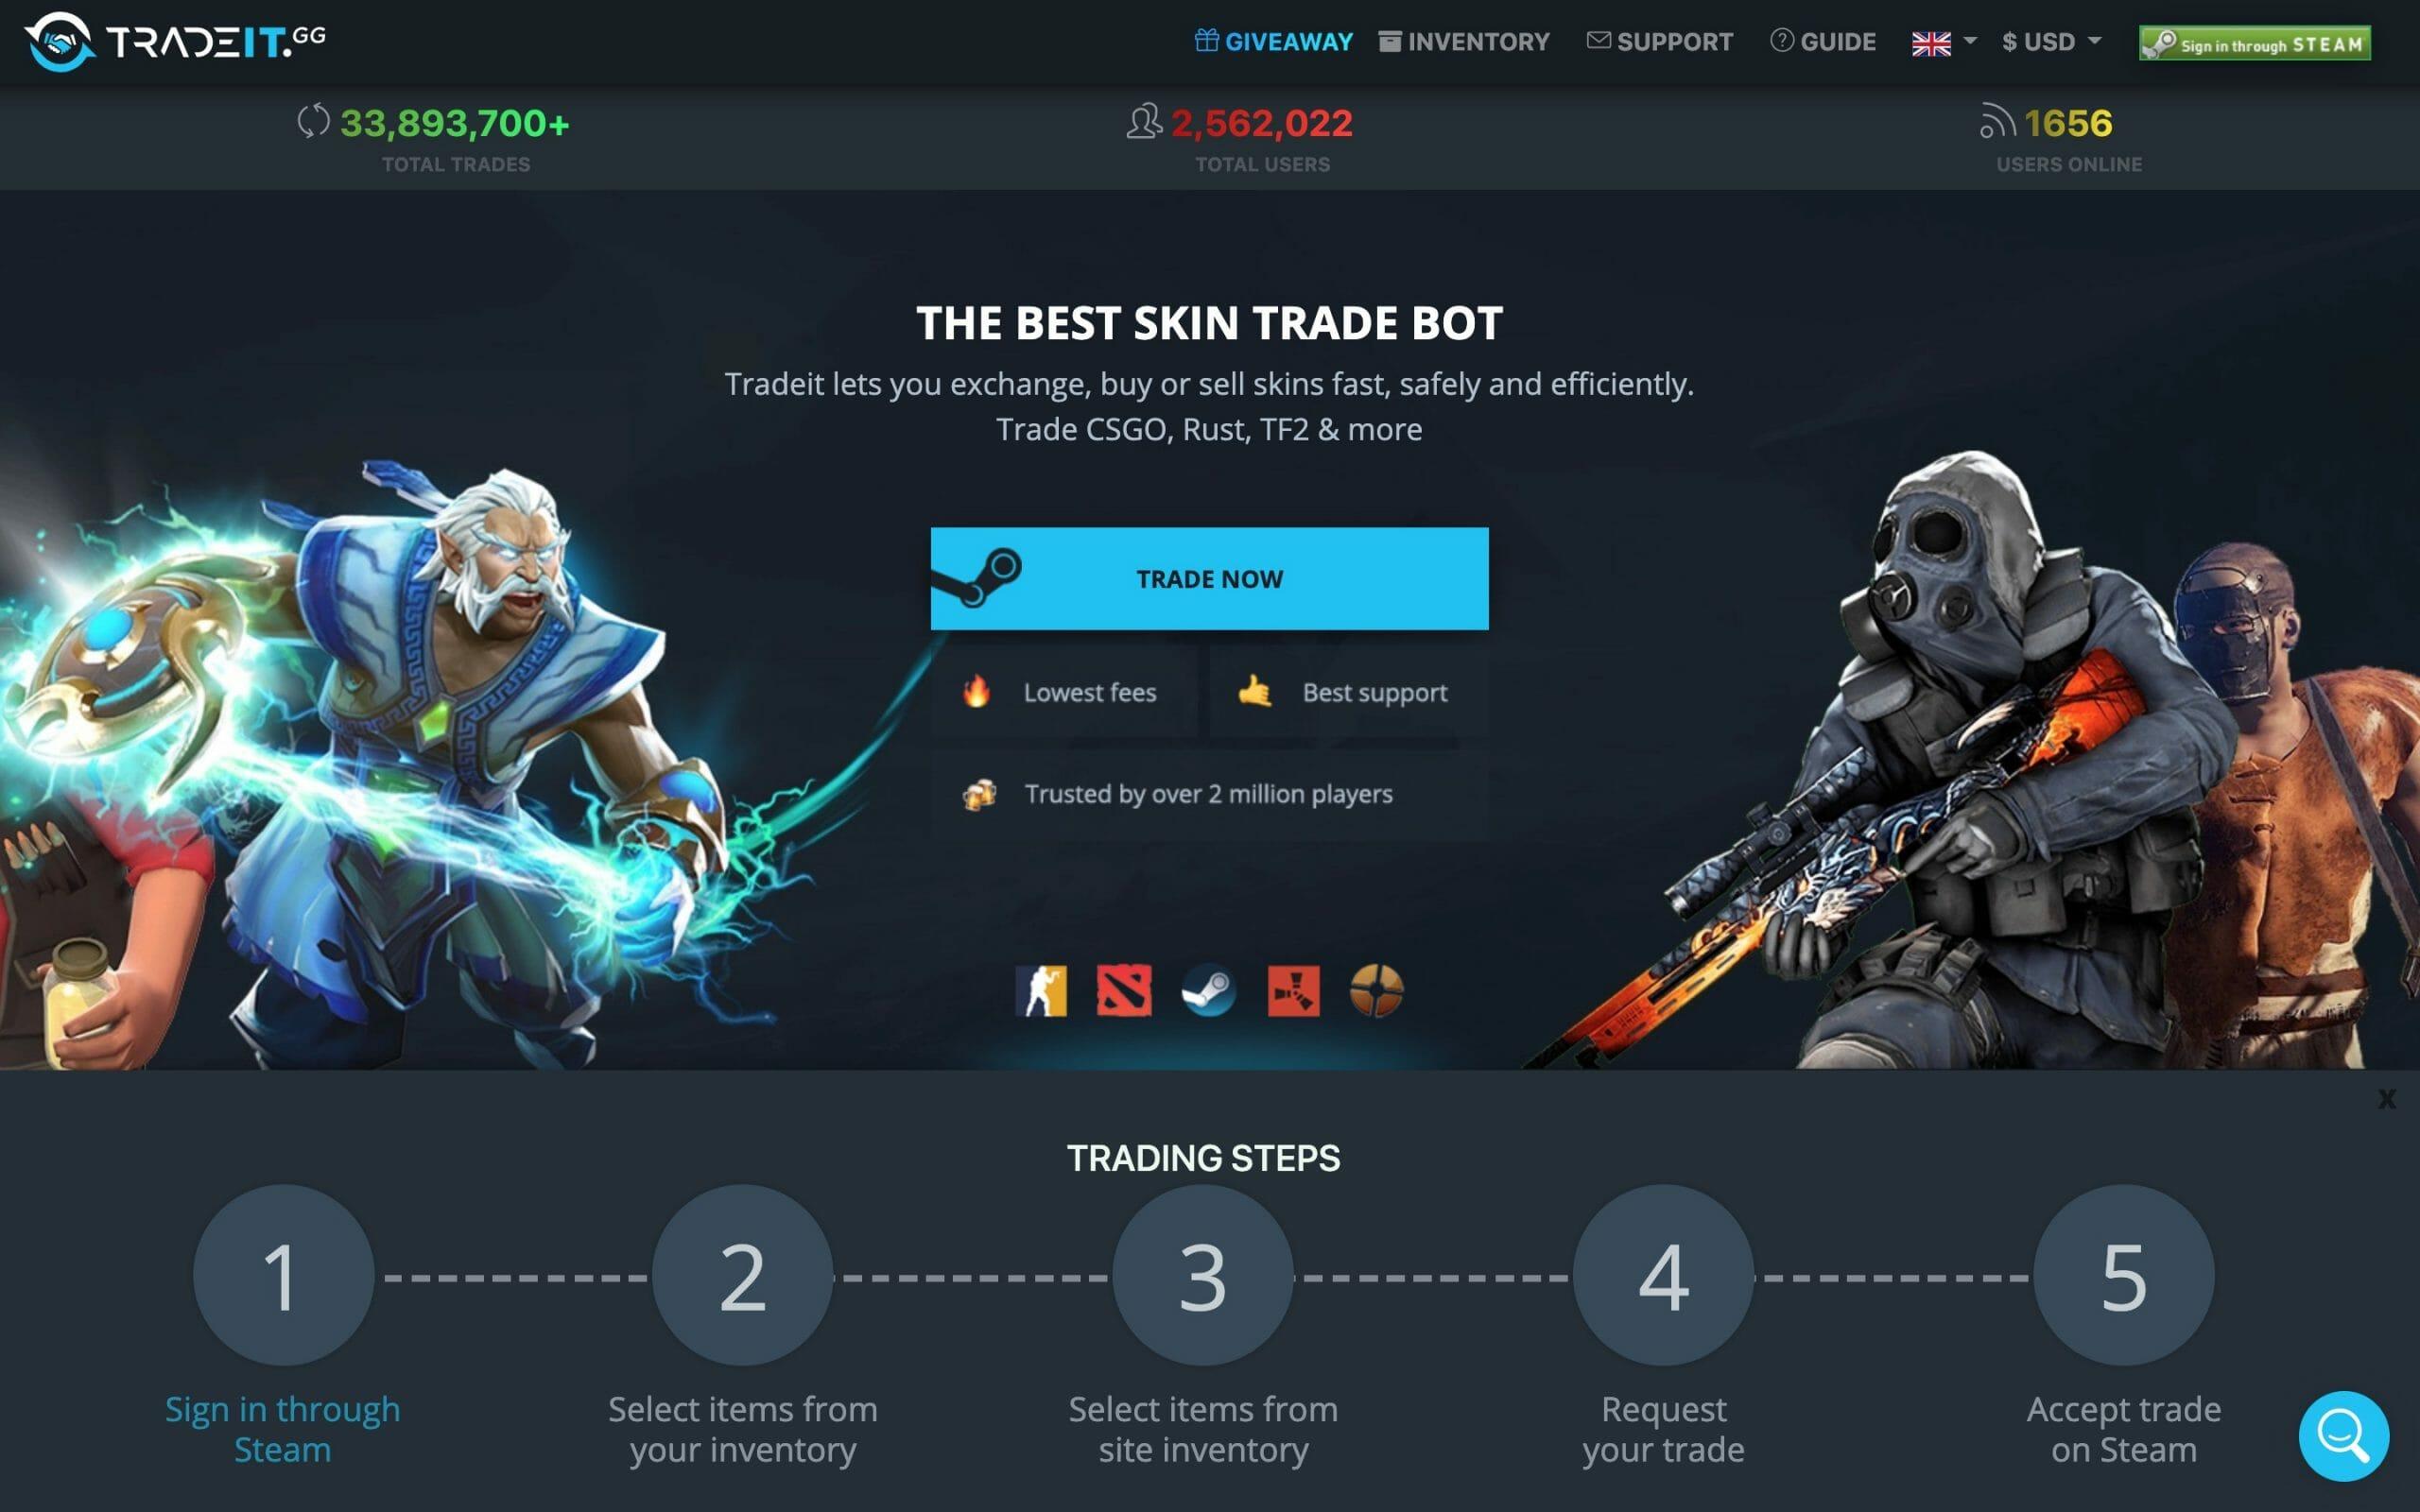 Tradeit.gg main page